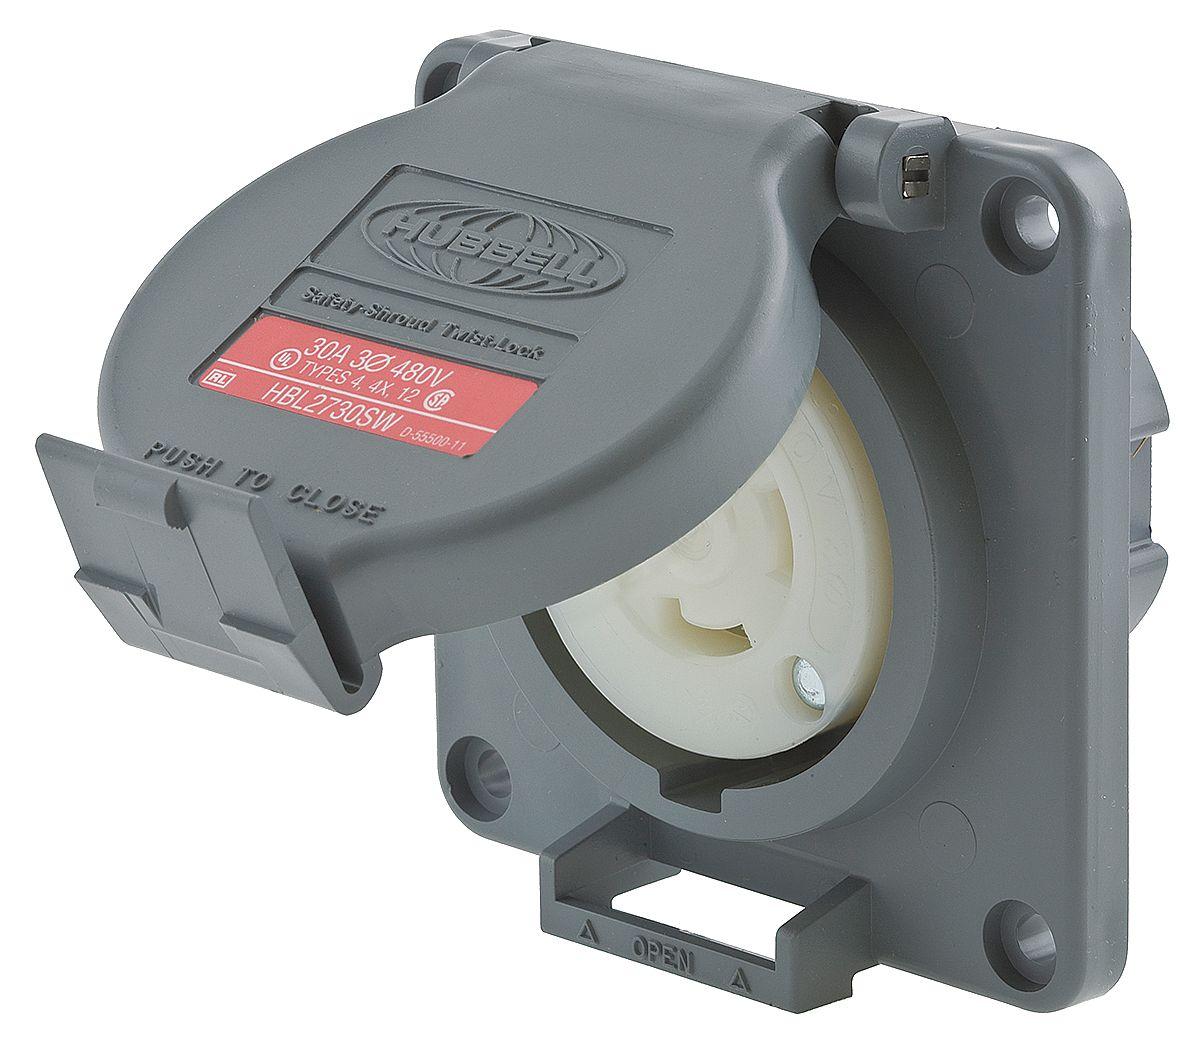 hbl2730sw hubbell wiring device kellems datasheet rh octopart com Hubbell Premise Wiring Catalog Hubbell Premise Wiring Fiber